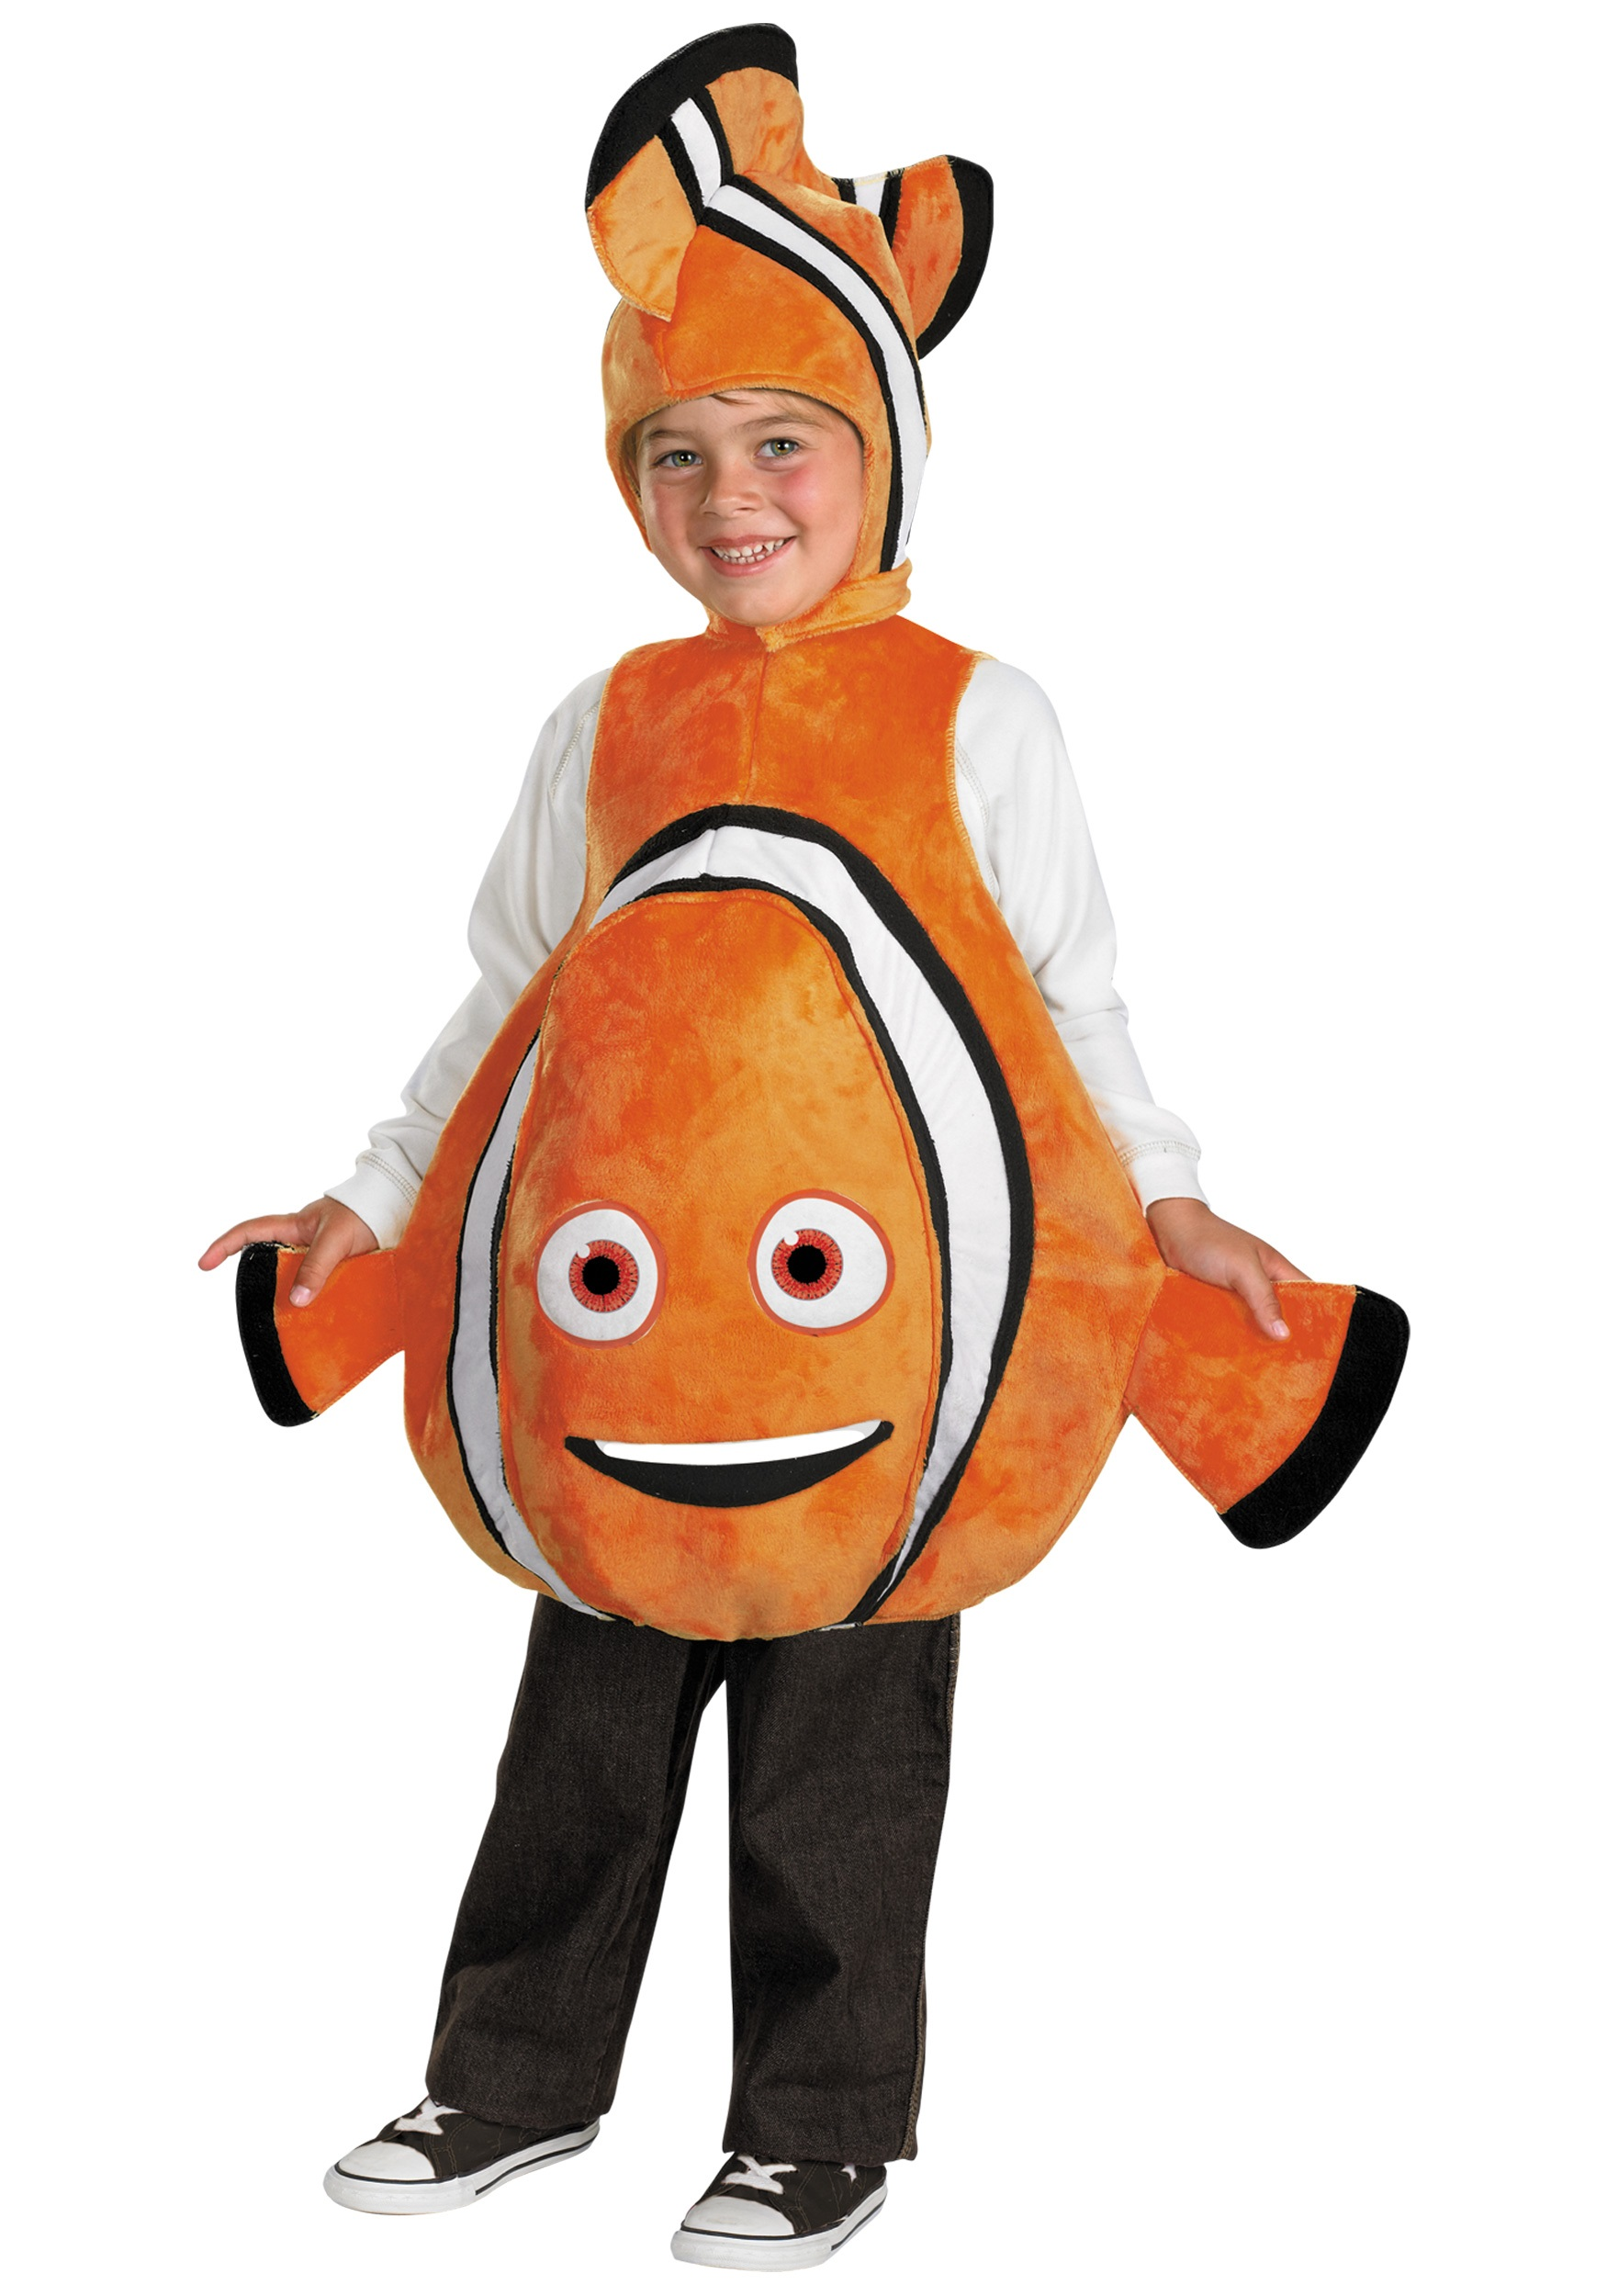 Toddler Deluxe Finding Nemo Costume  sc 1 st  Halloween Costumes AU & Toddler Deluxe Finding Nemo Costume - Nemo Costume for Toddlers